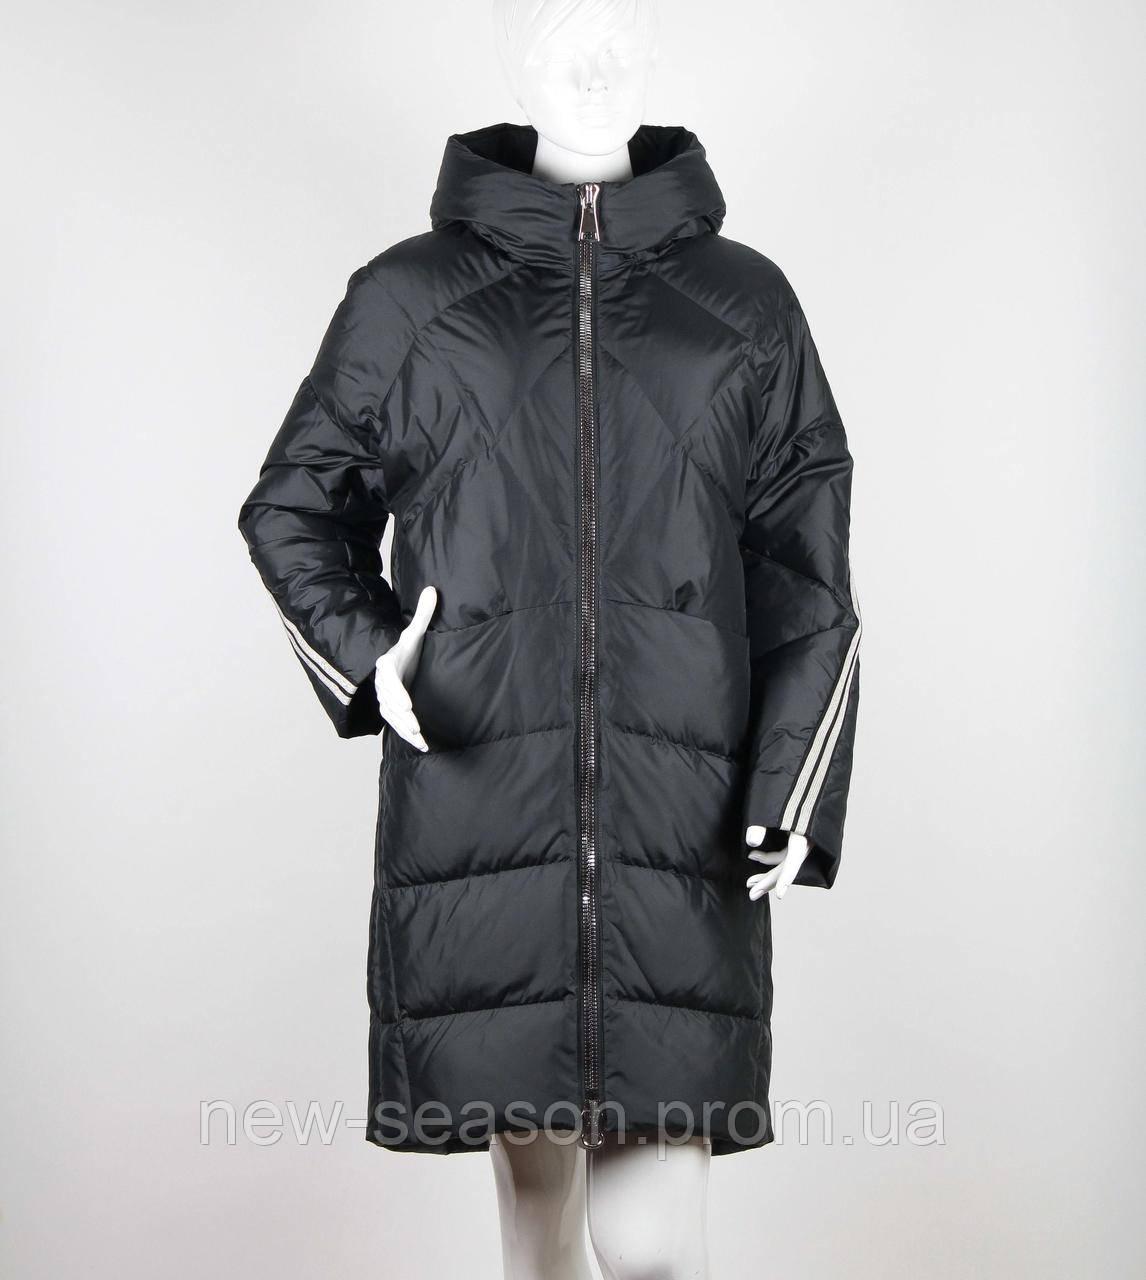 Куртка на натуральном пуху Chiago JF9663